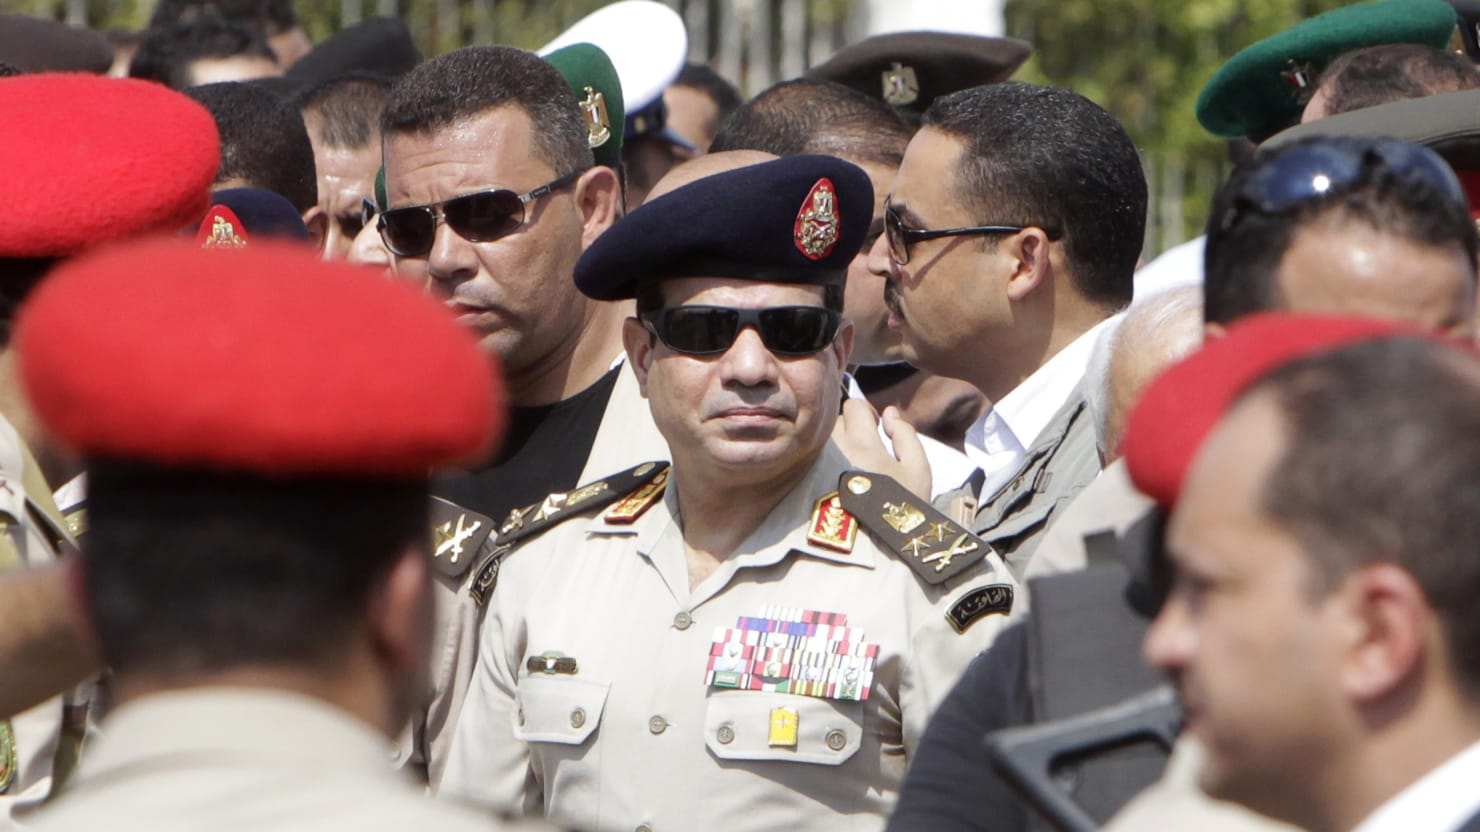 Egypt's General Abdel Fattah El-Sisi Cleared For Presidential Run